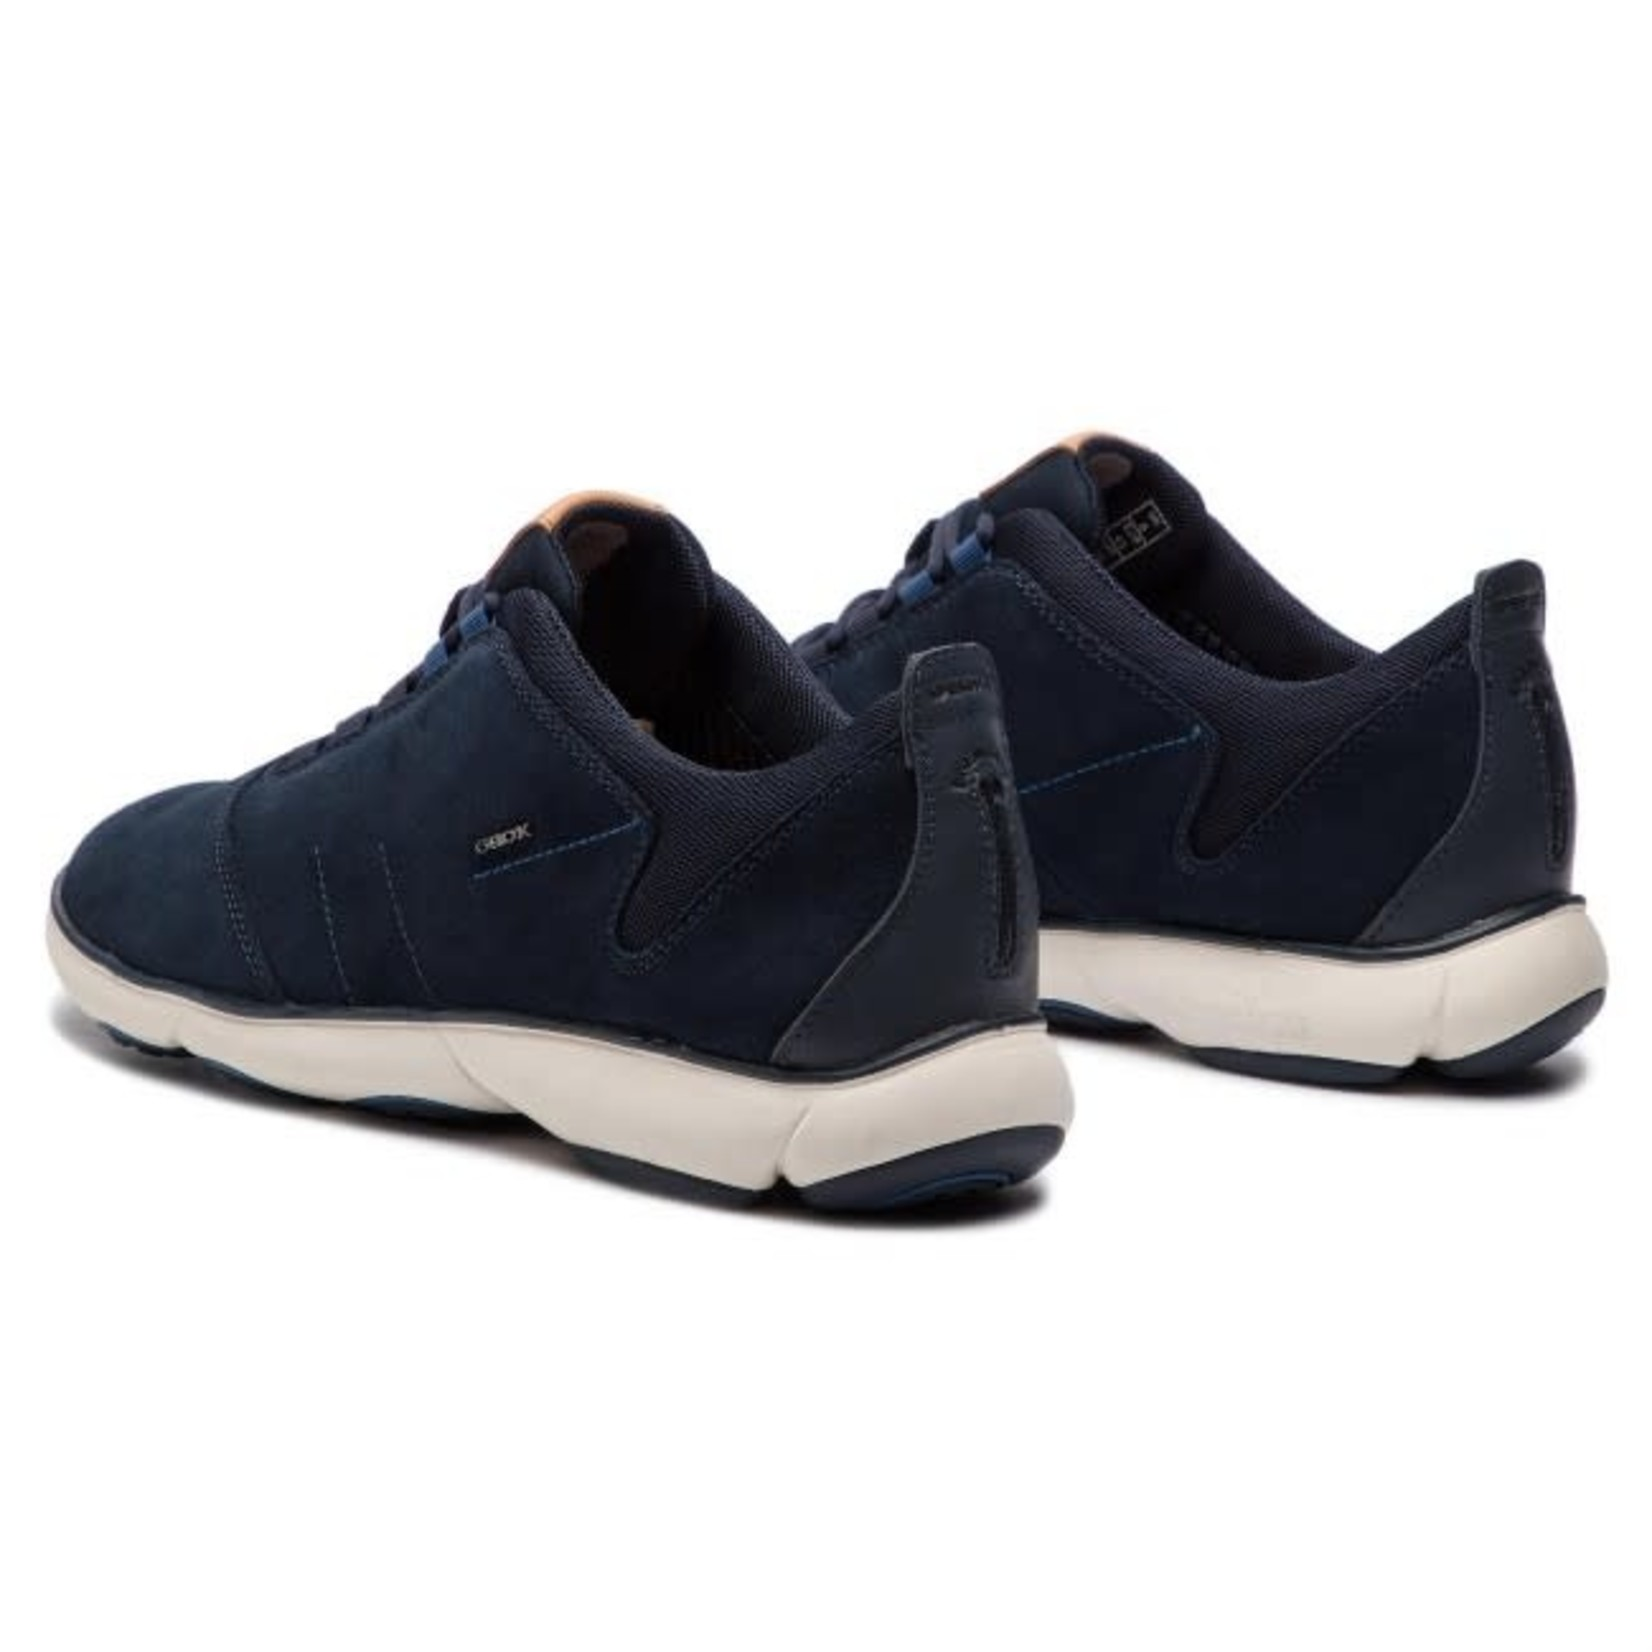 GEOX Geox - Men's Sneakers - U Nebula C